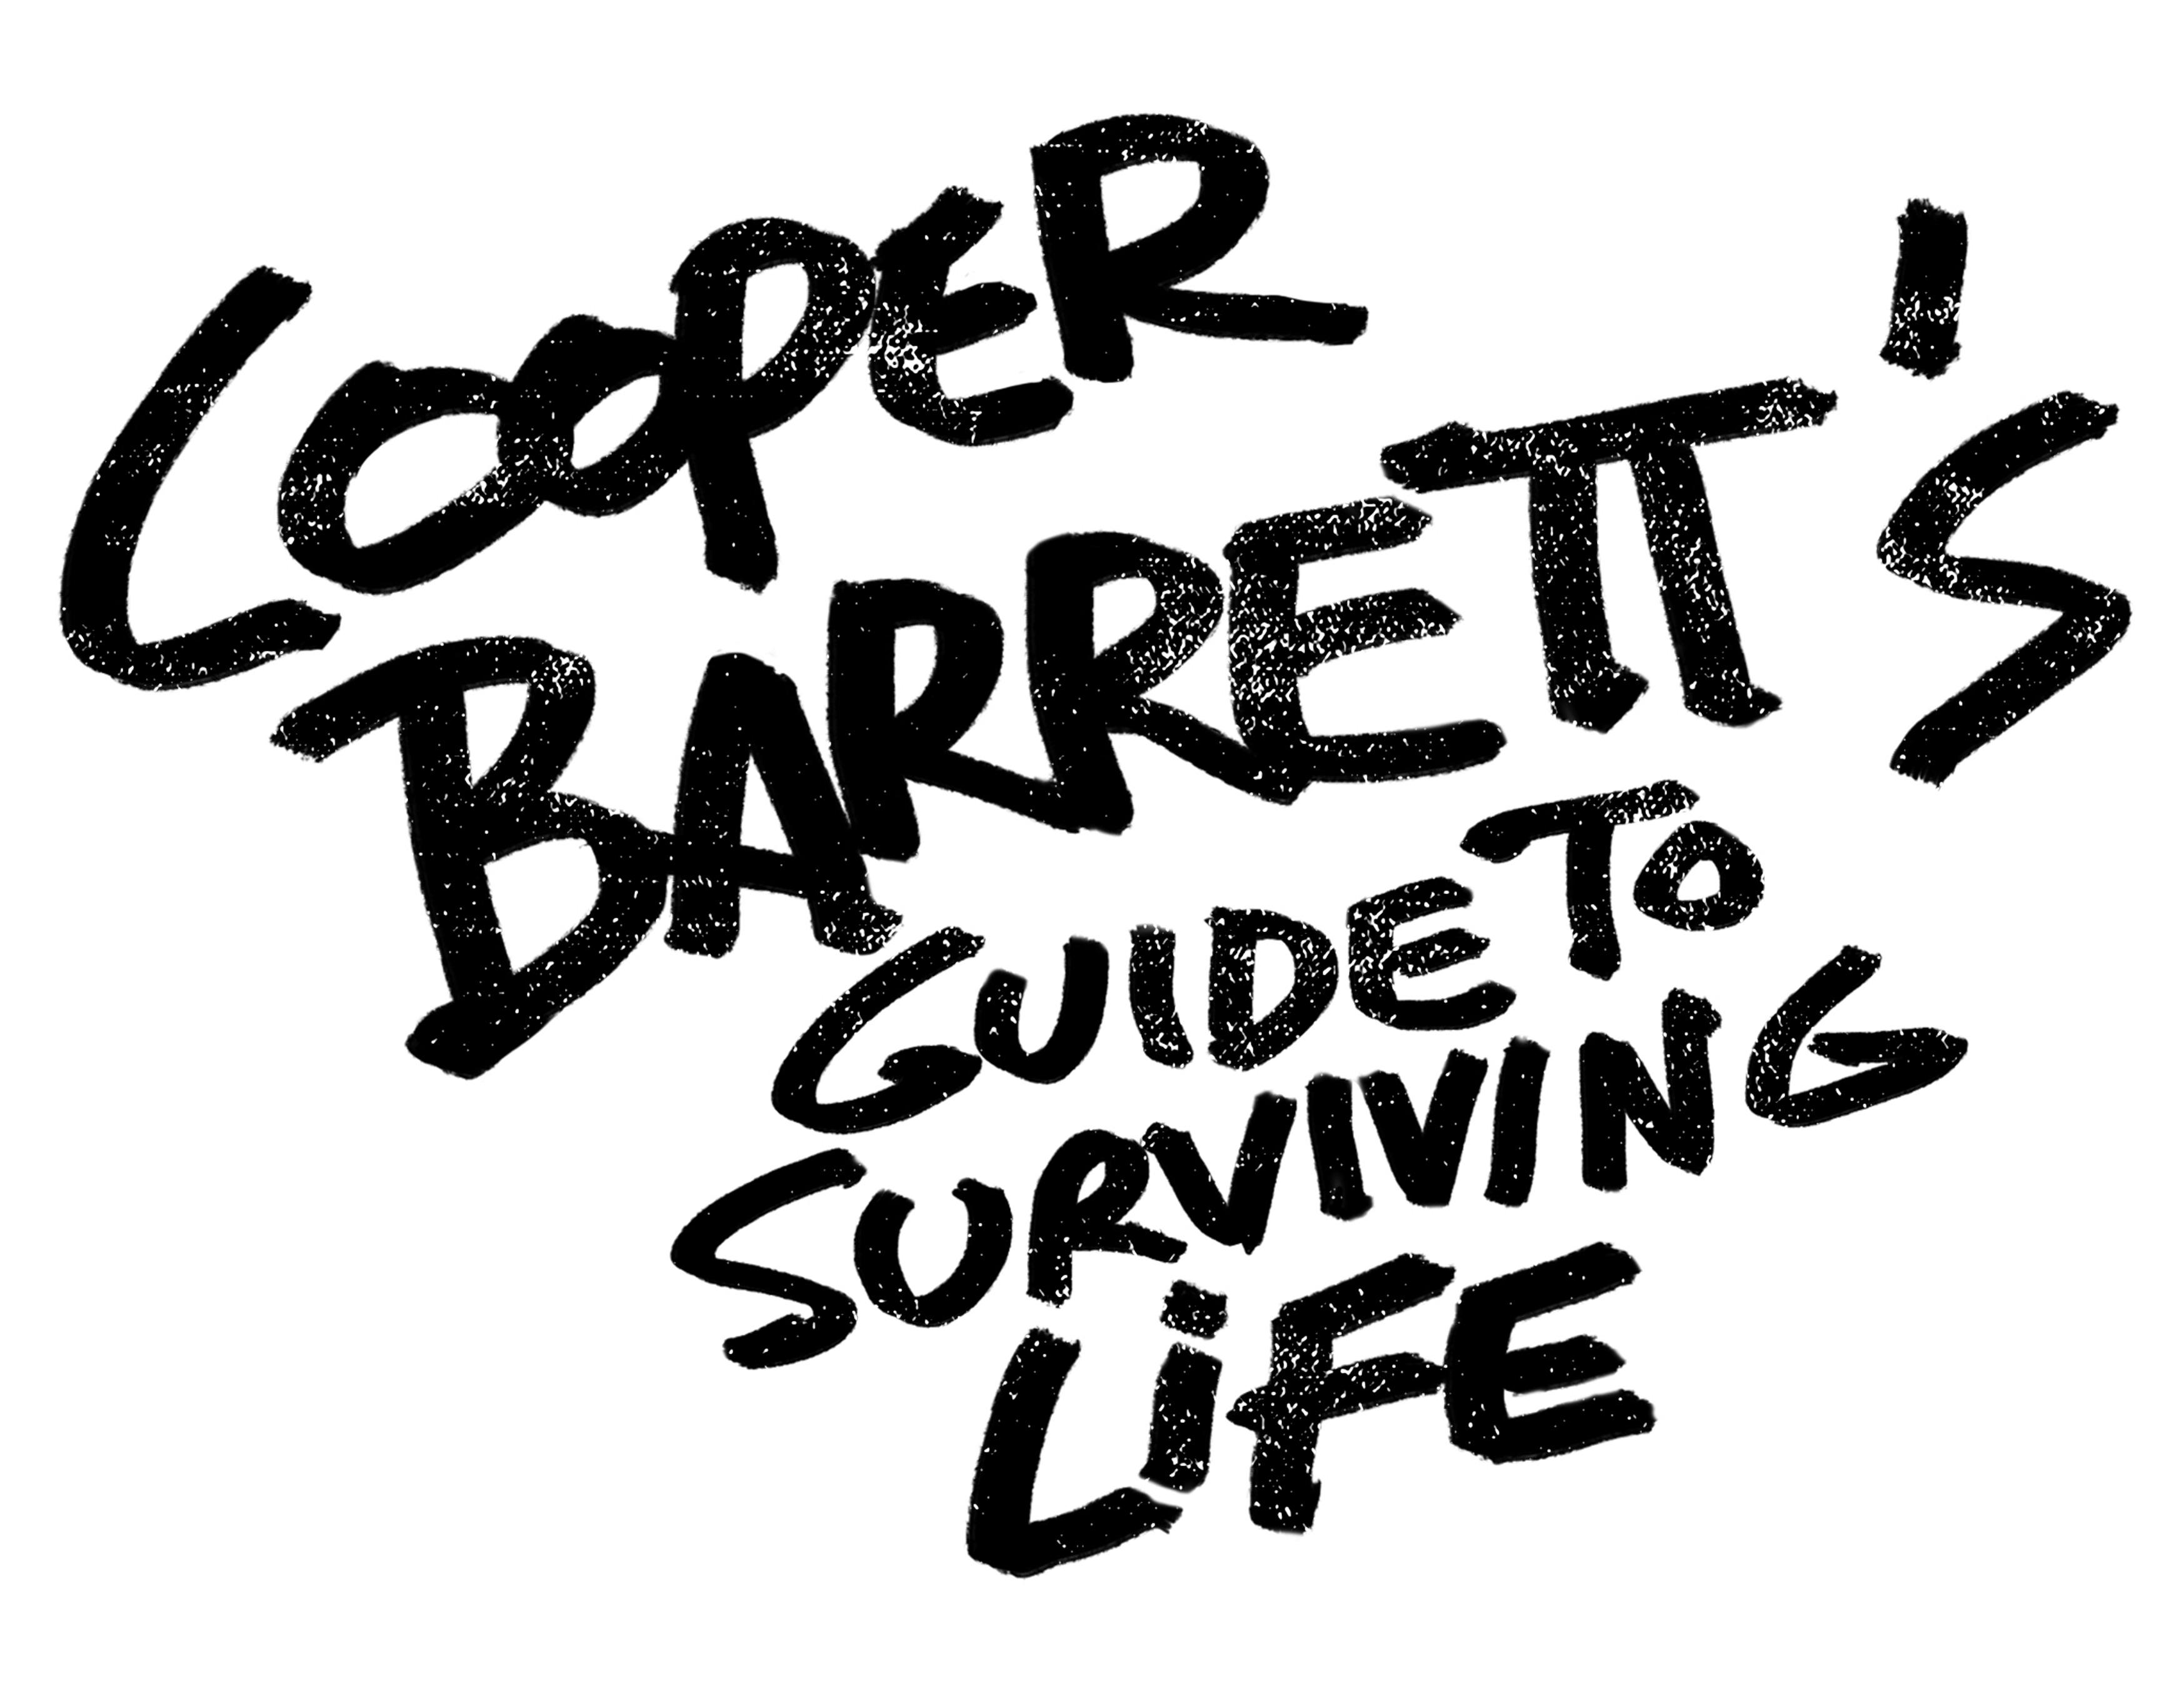 Cooper_Barret_Logo_r_original2.v2.20151215_ab_hires2.jpg